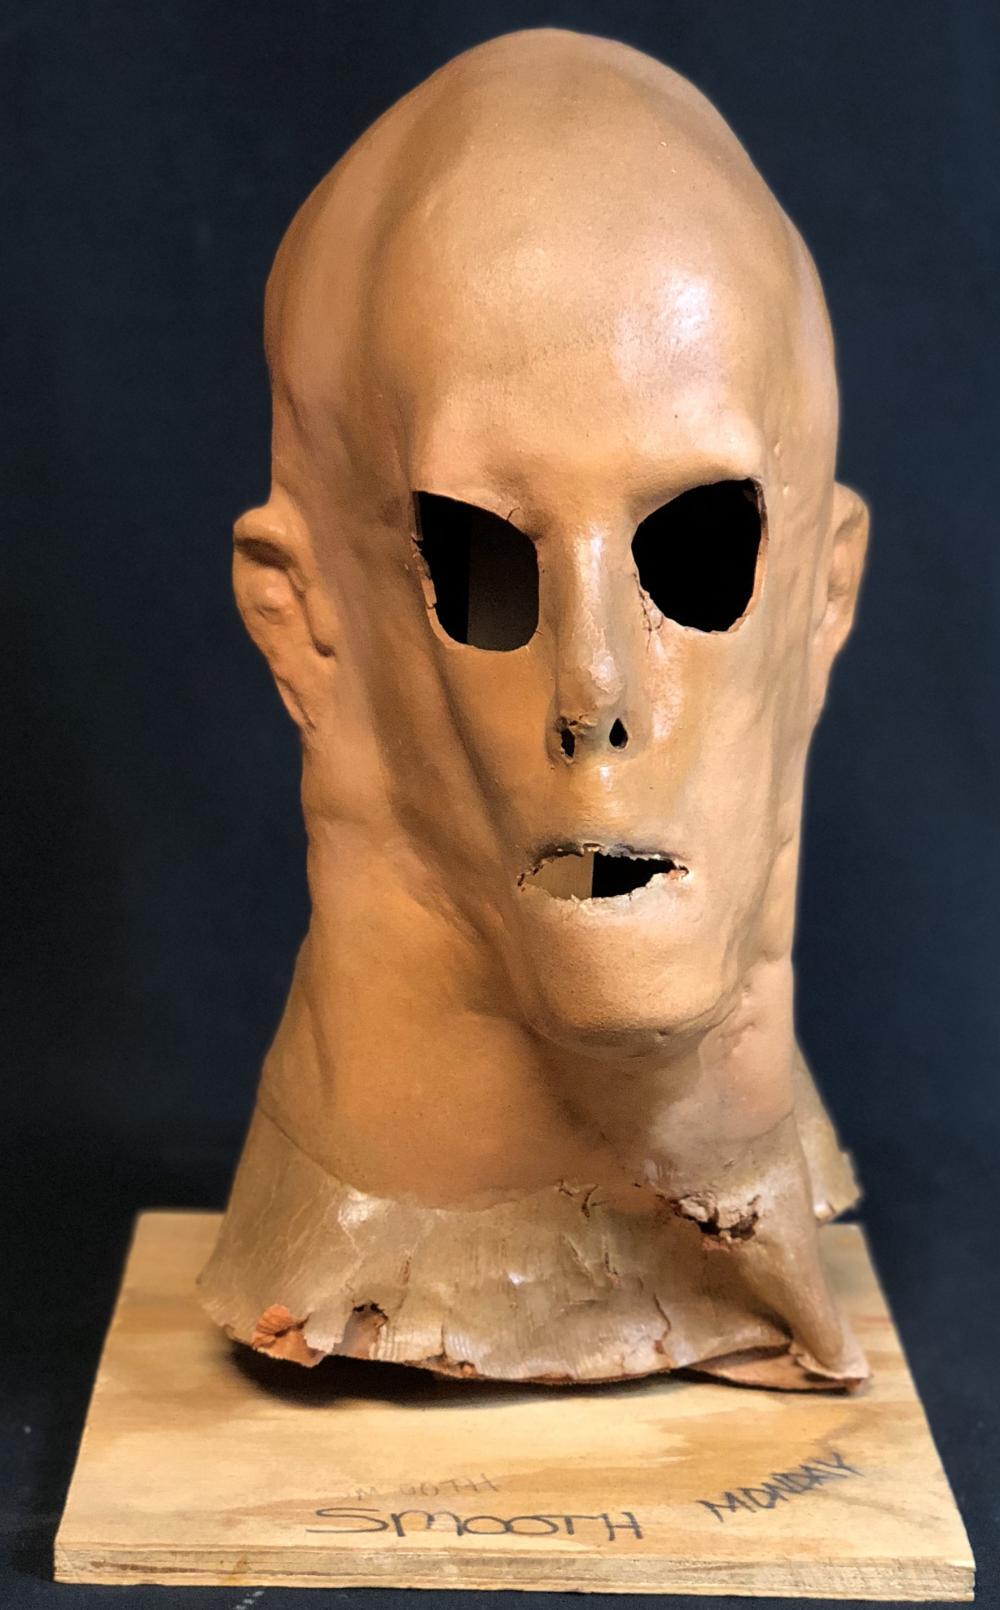 Hollow Man (2000) - Full Kevin Bacon Head Appliance